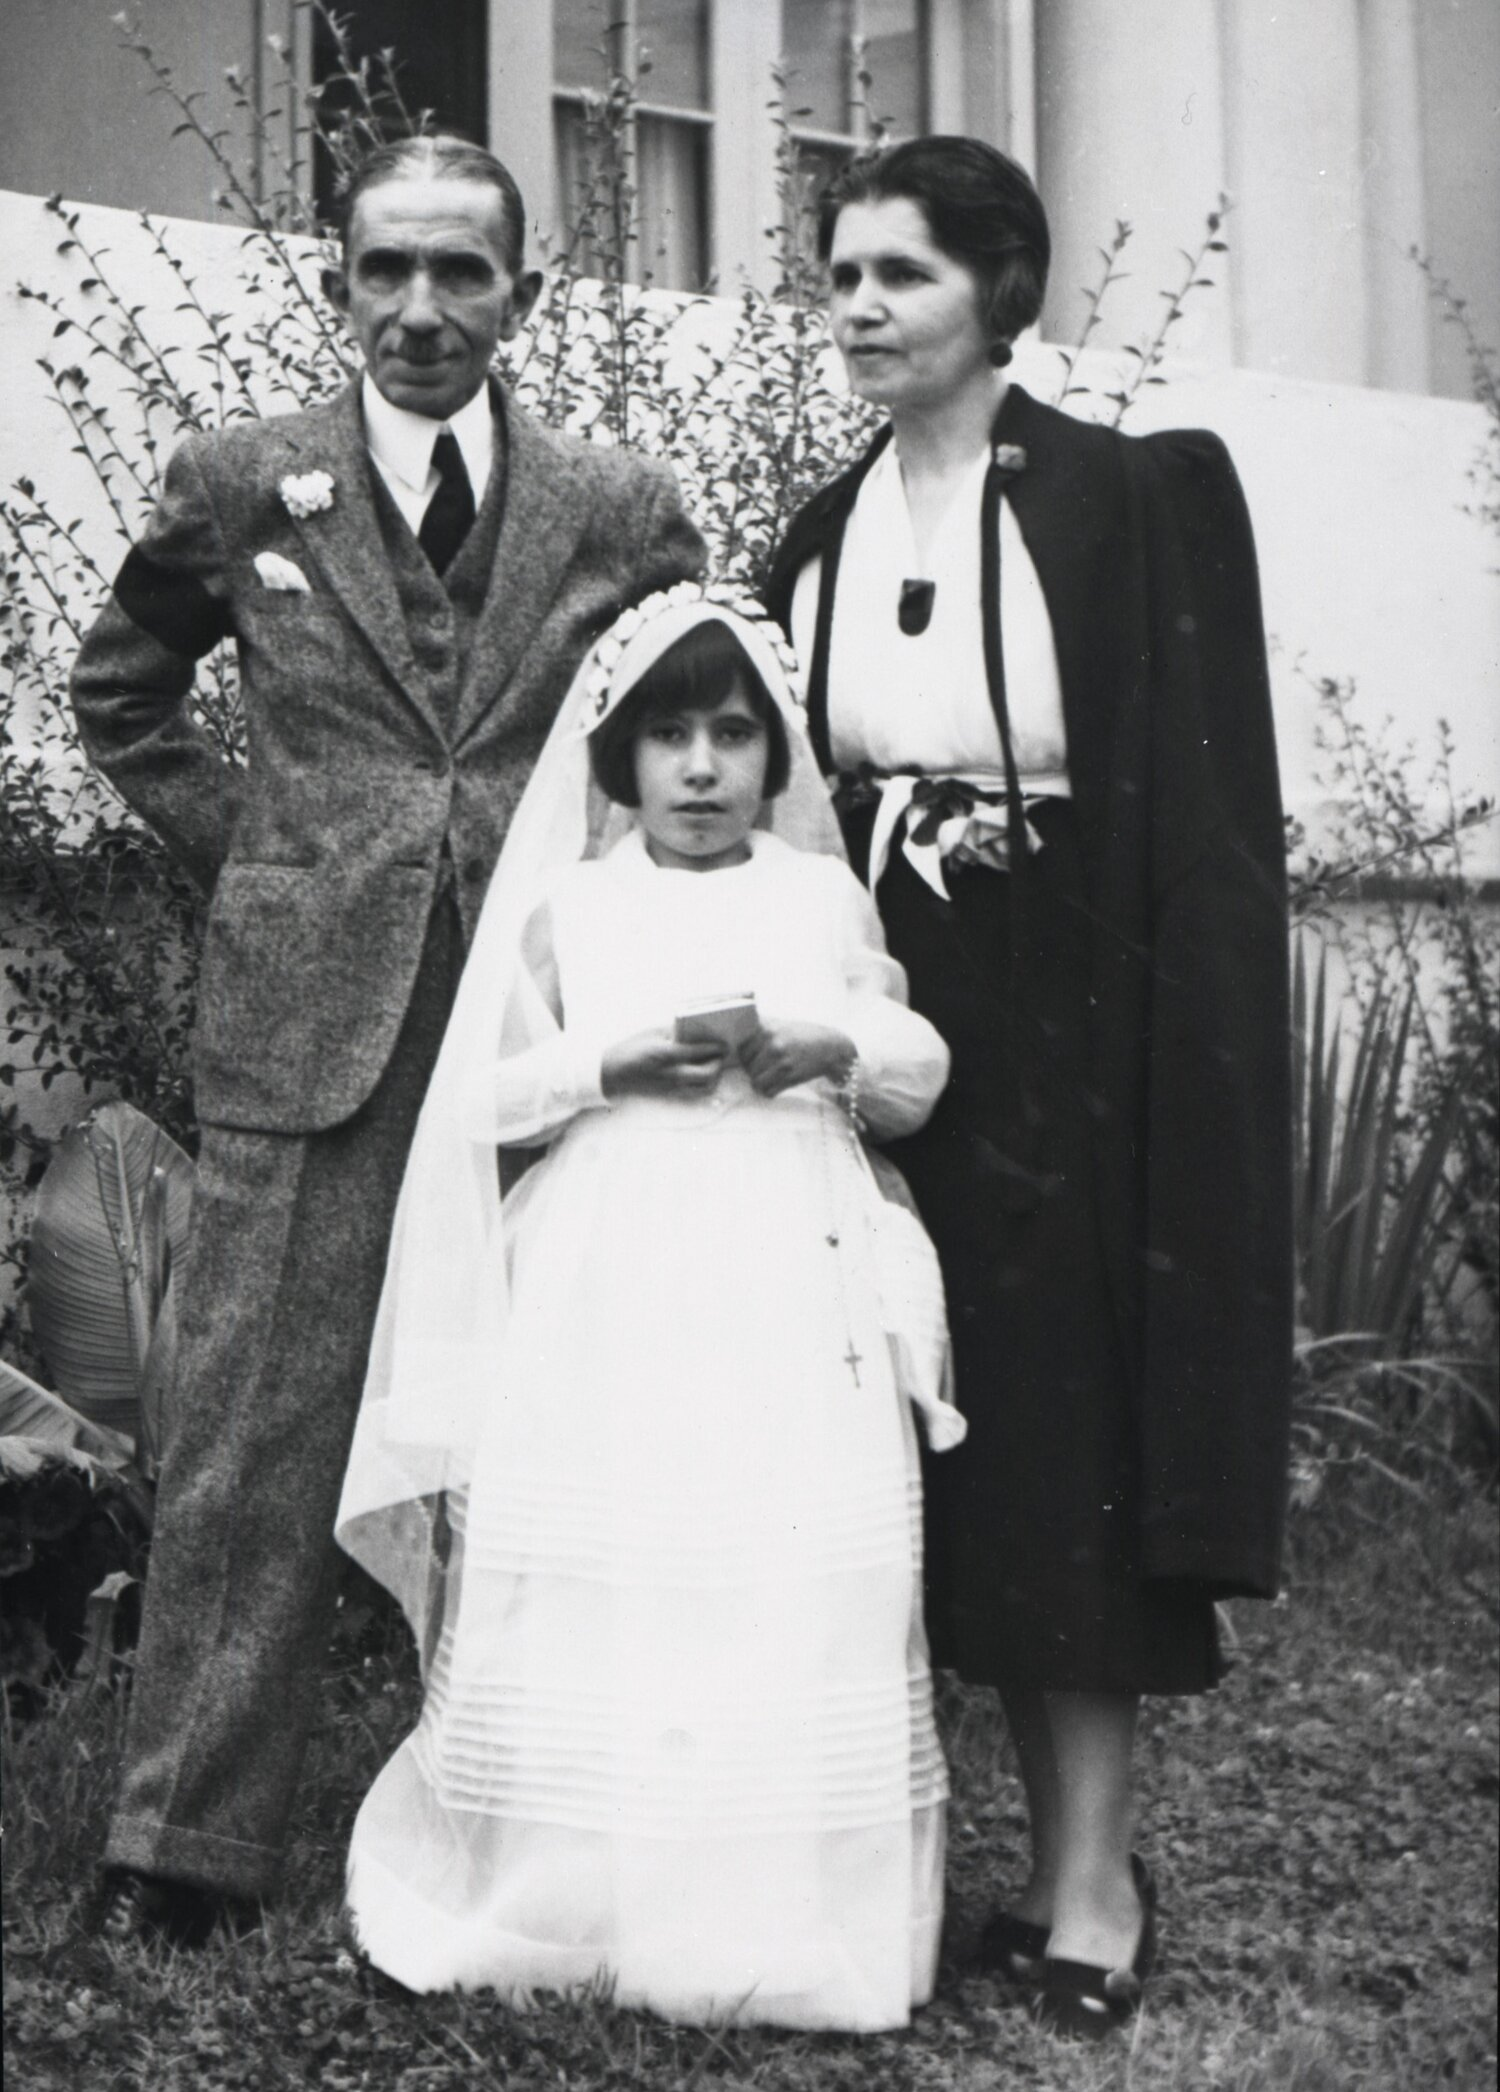 Alfredo Ramos Martinez with his wife, Maria Sodi de Ramos Martinez, and daughter, Maria.